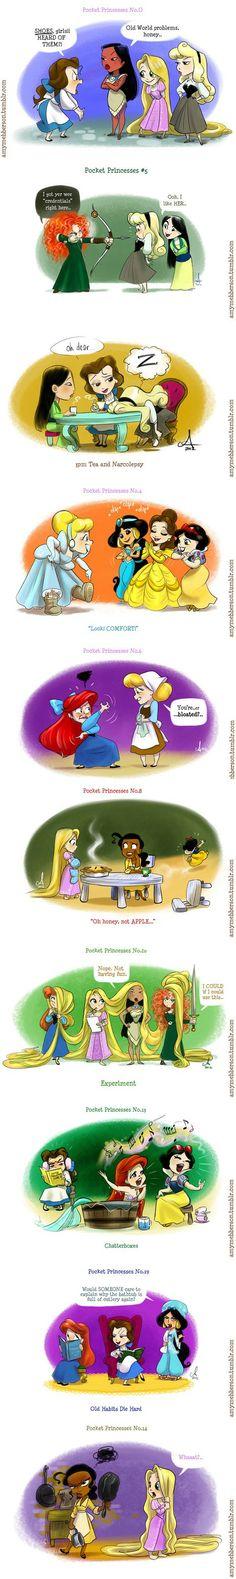 if disney princesses hung out